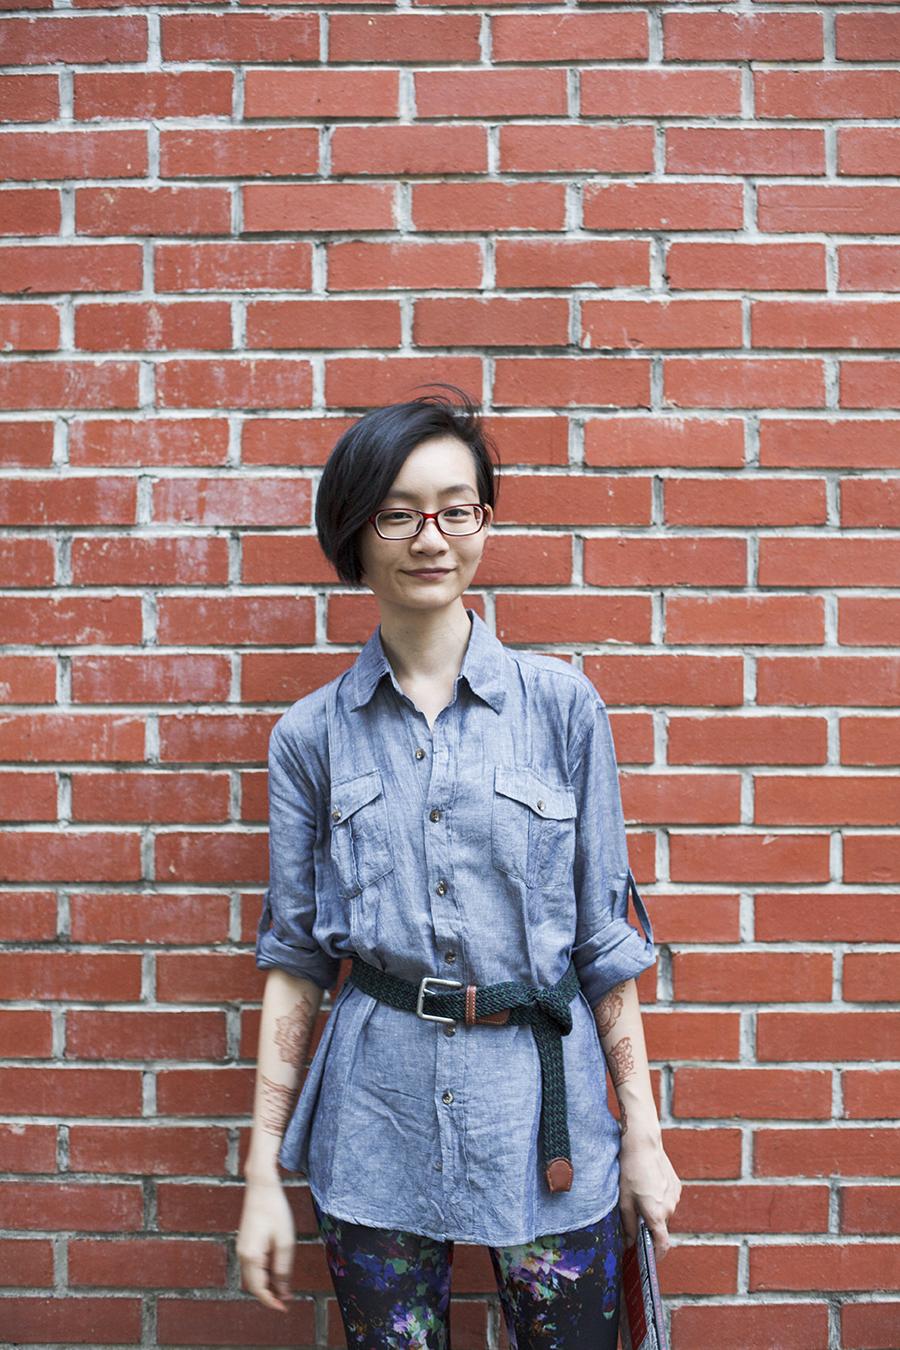 H&M abstract print leggings, linen menswear shirt, Firmoo glasses, braided belt.